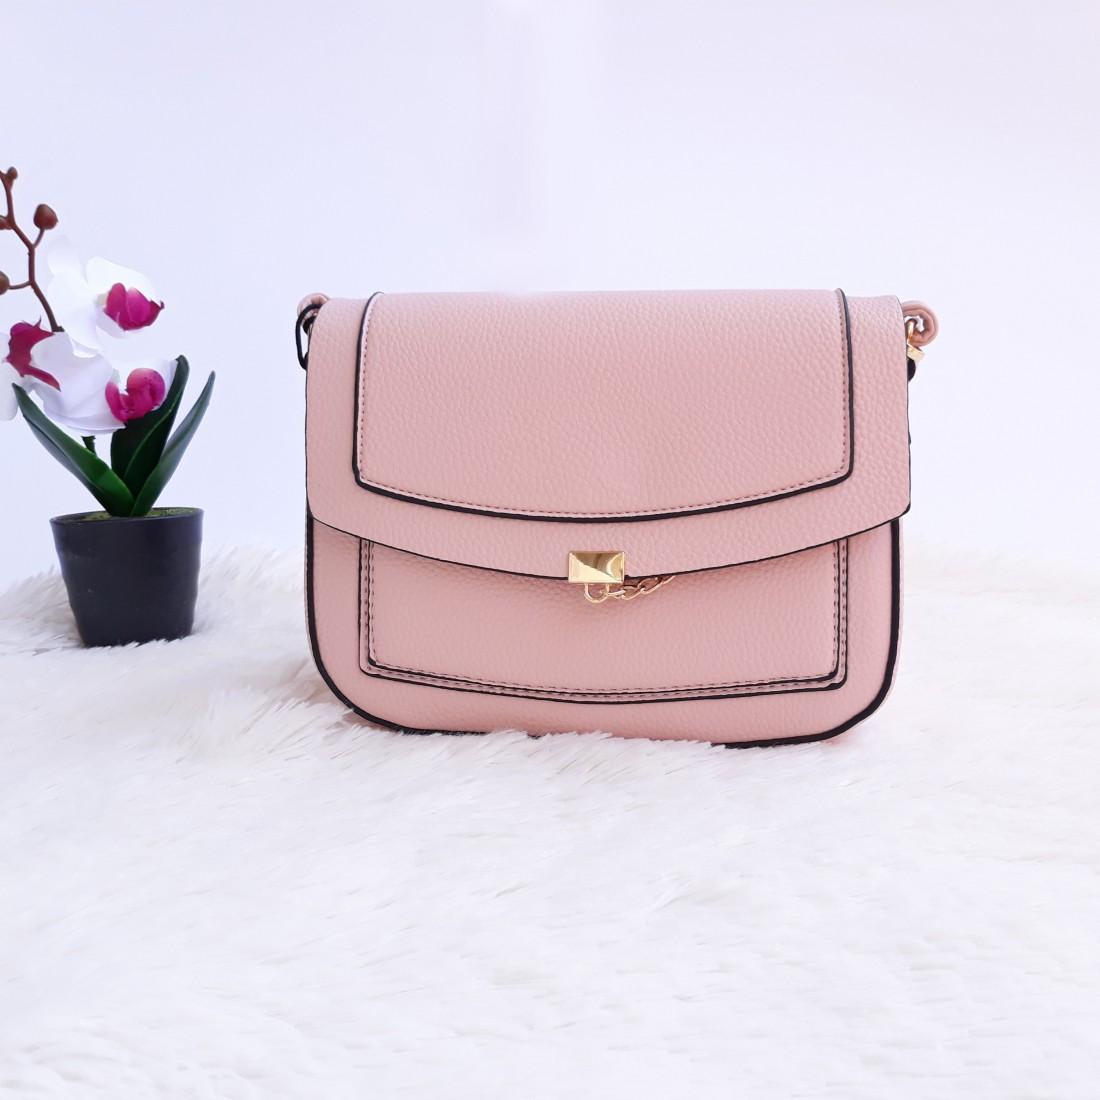 Дамска чанта през рамо - код 2882 - розова